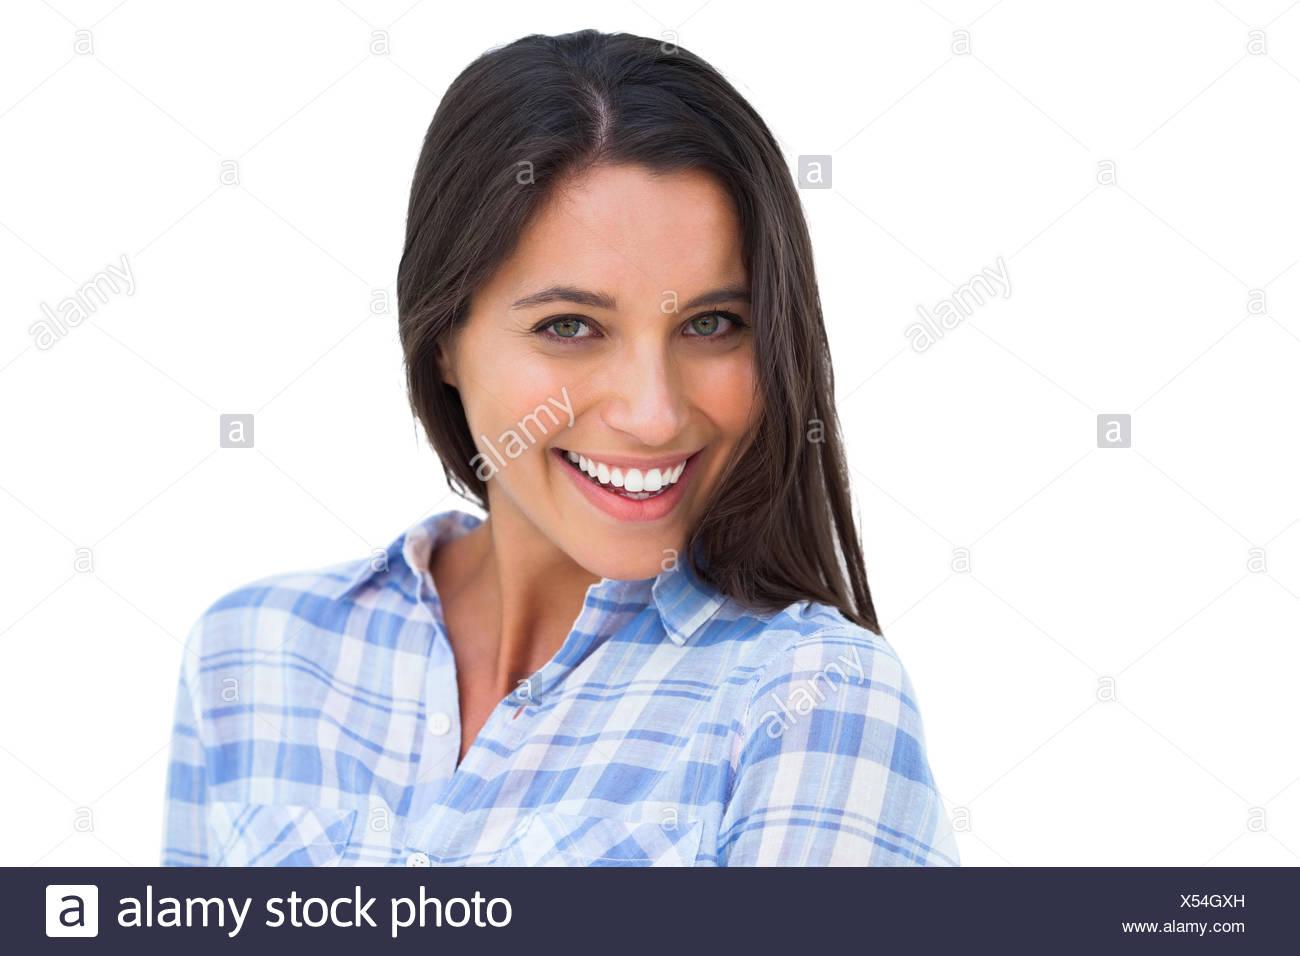 Junge Brünette lächelnd in die Kamera Stockbild